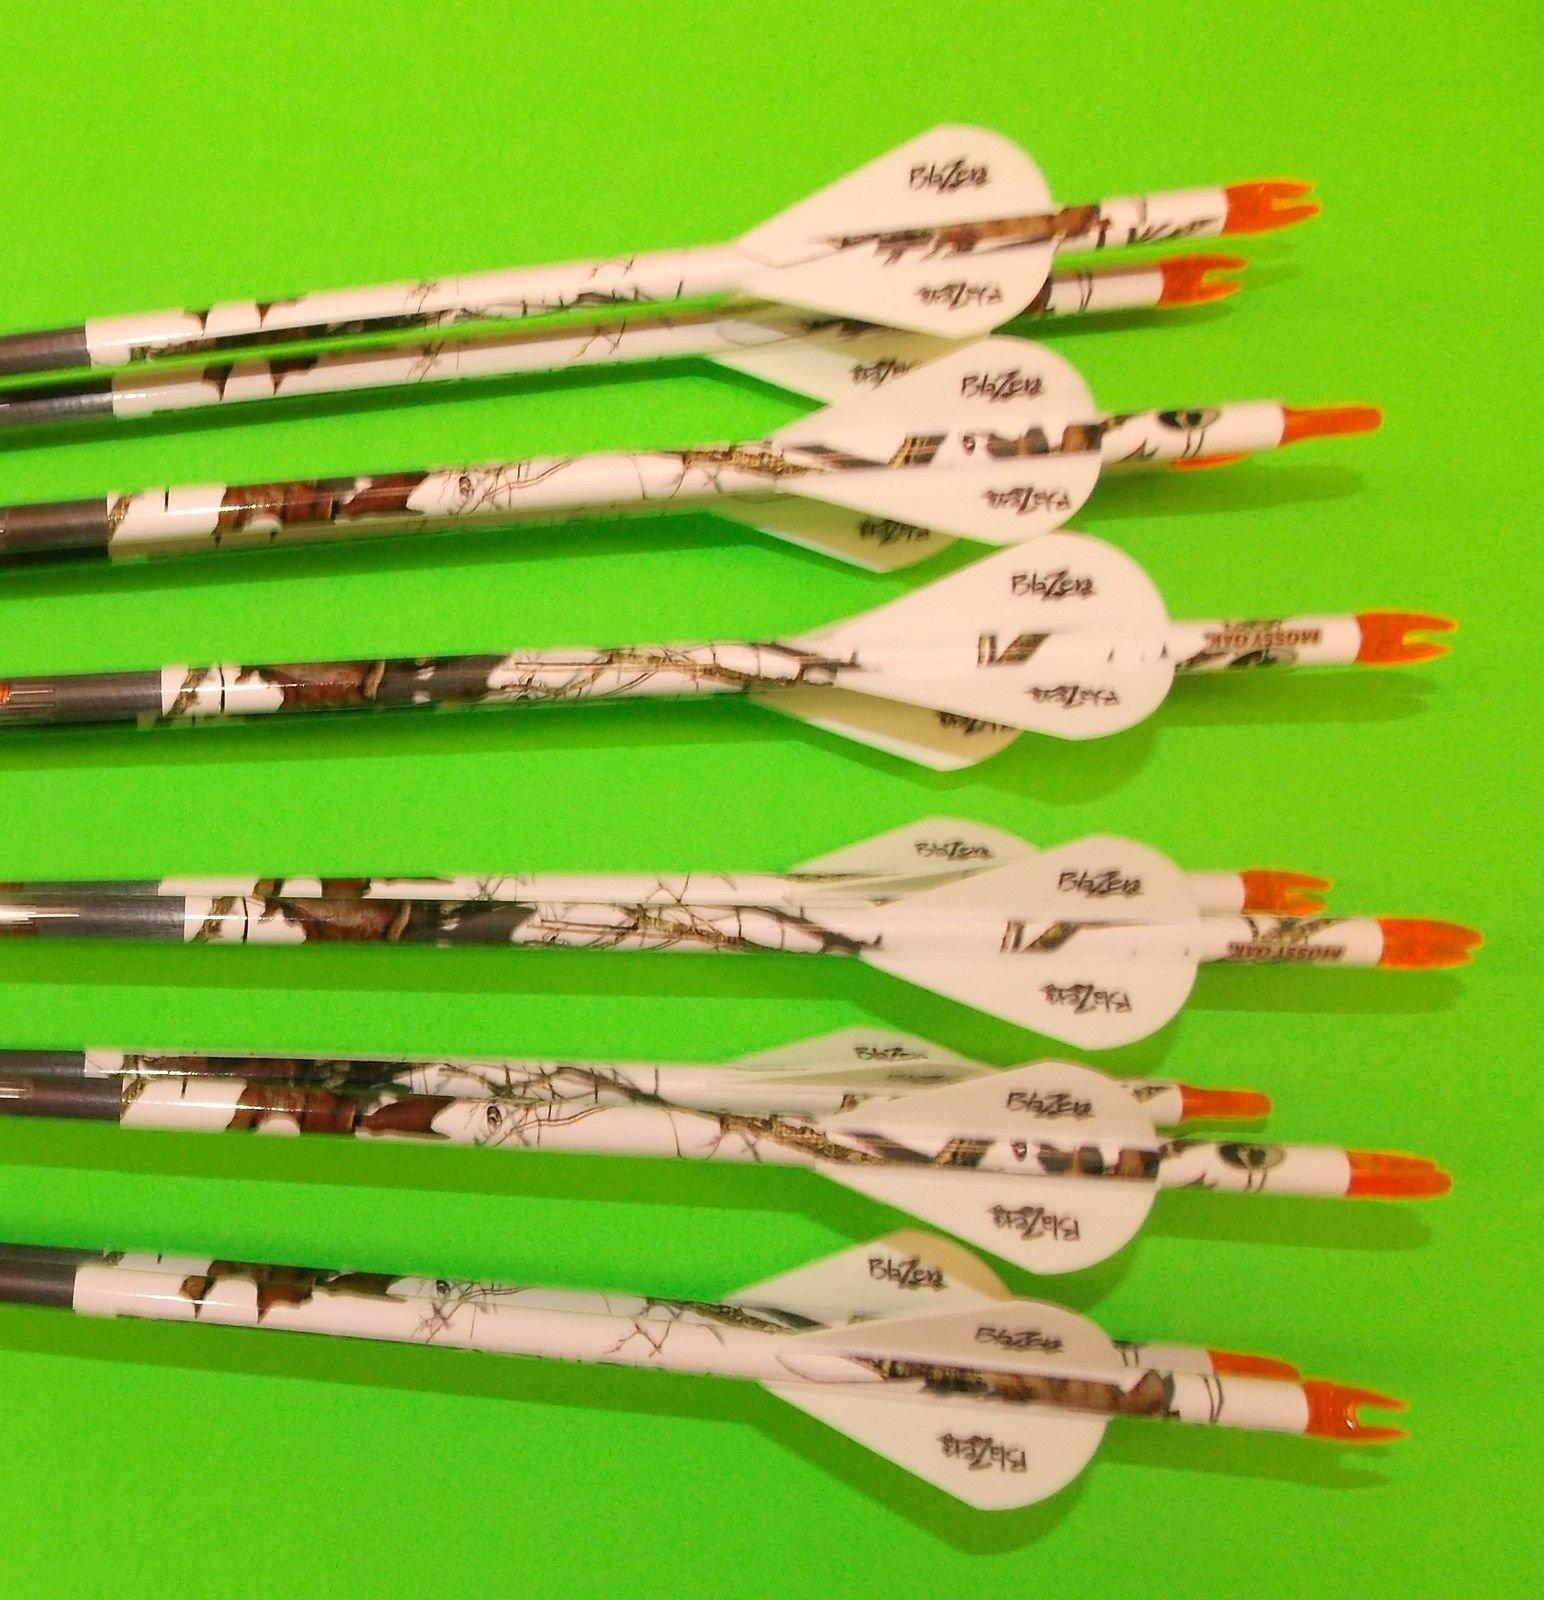 Easton ST Axis Full Metal Jacket Arrows 300/340/400/500 w/Blazer Vanes Blaze Wraps 1Dz. by ST Axis (Image #1)